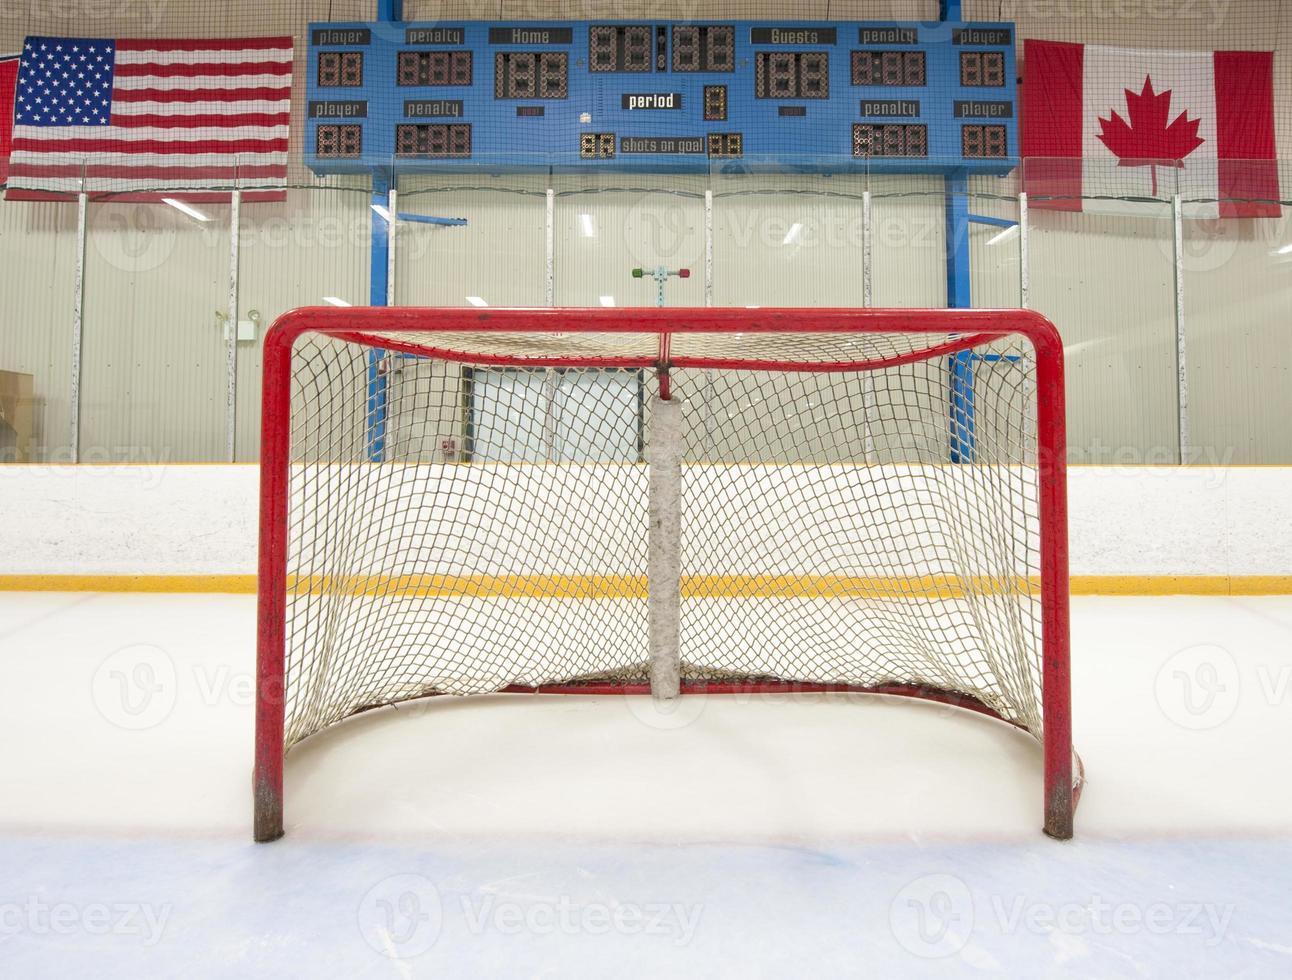 hockeynet met scorebord foto